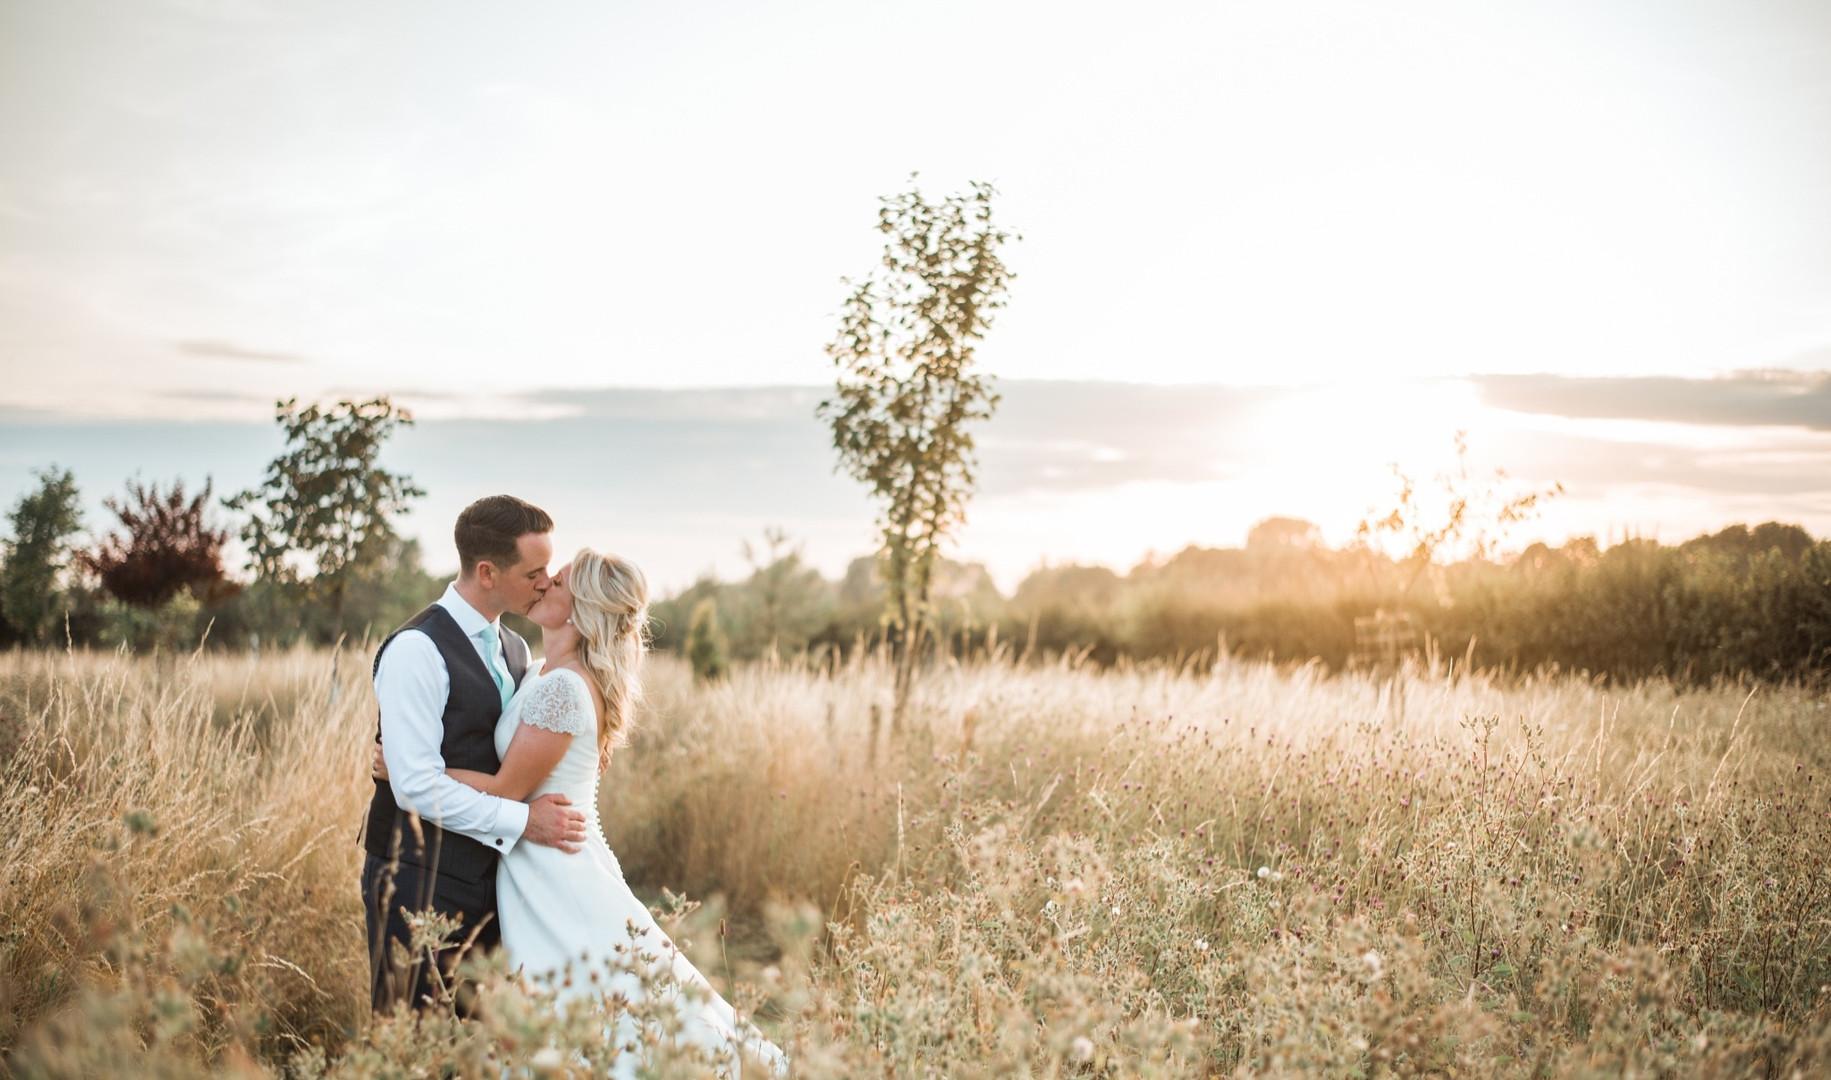 Mike and Rachel Wedding 2-8-19-898_edite